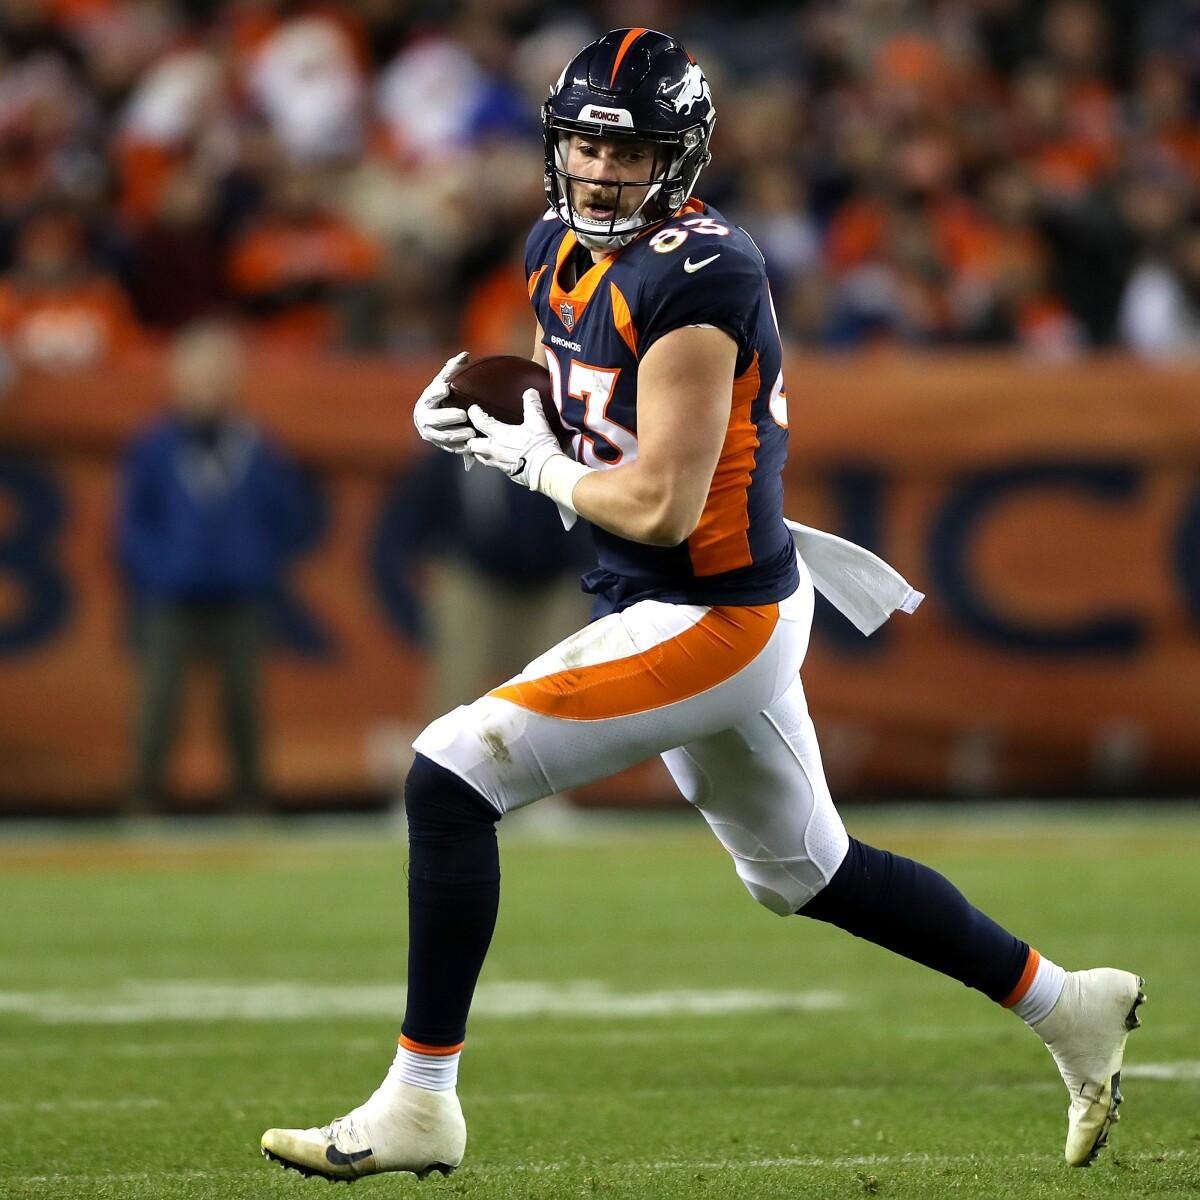 Denver News Closures: Denver Broncos Vs. Oakland Raiders: Follow The Action In